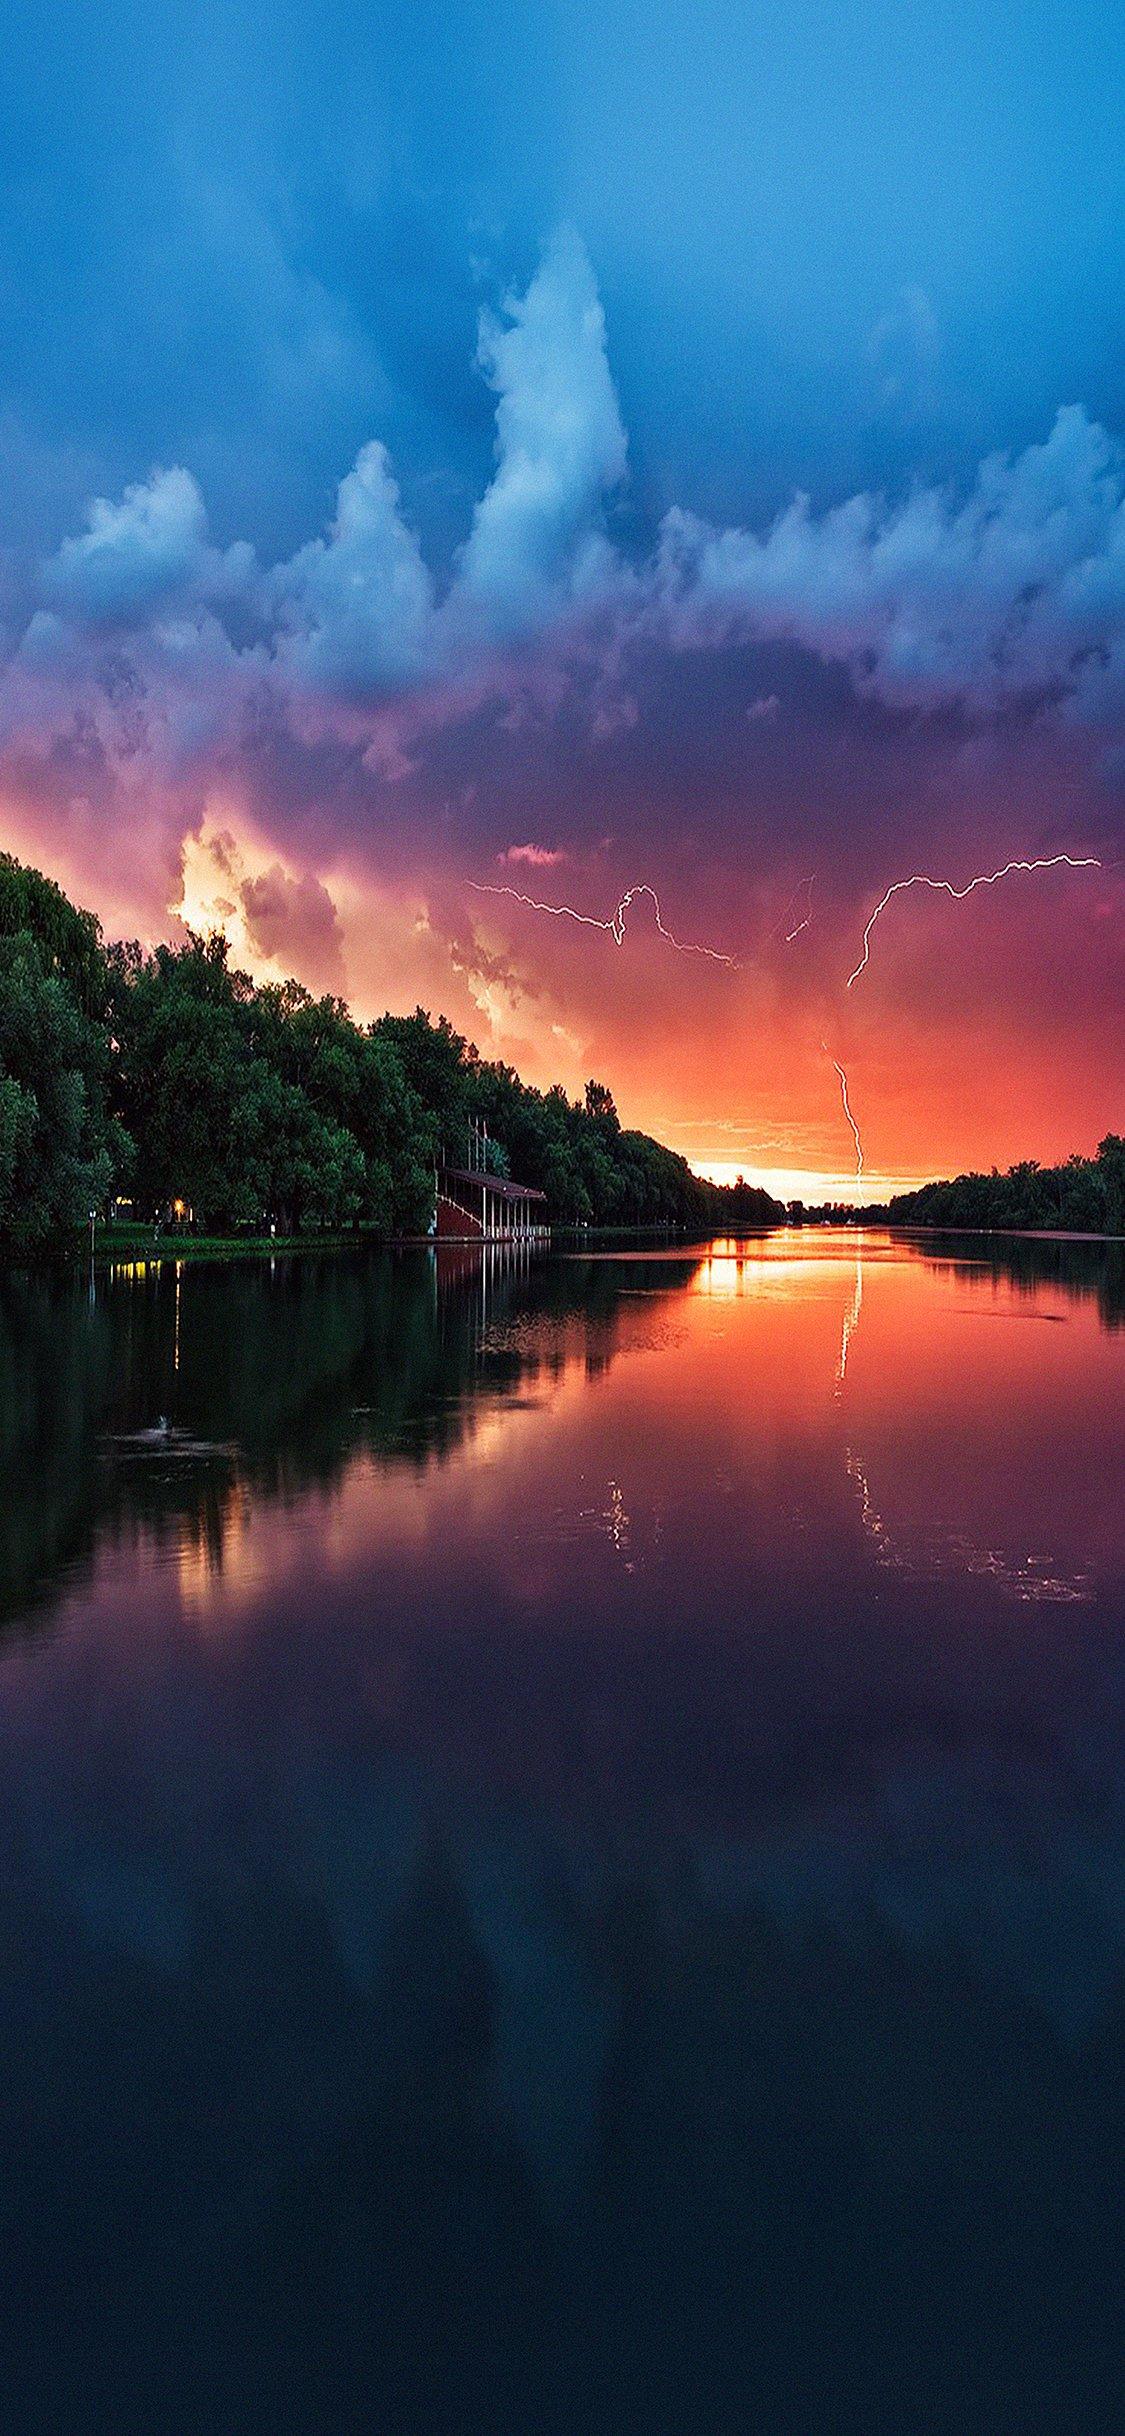 Lightening reflected lake iPhone X wallpaper